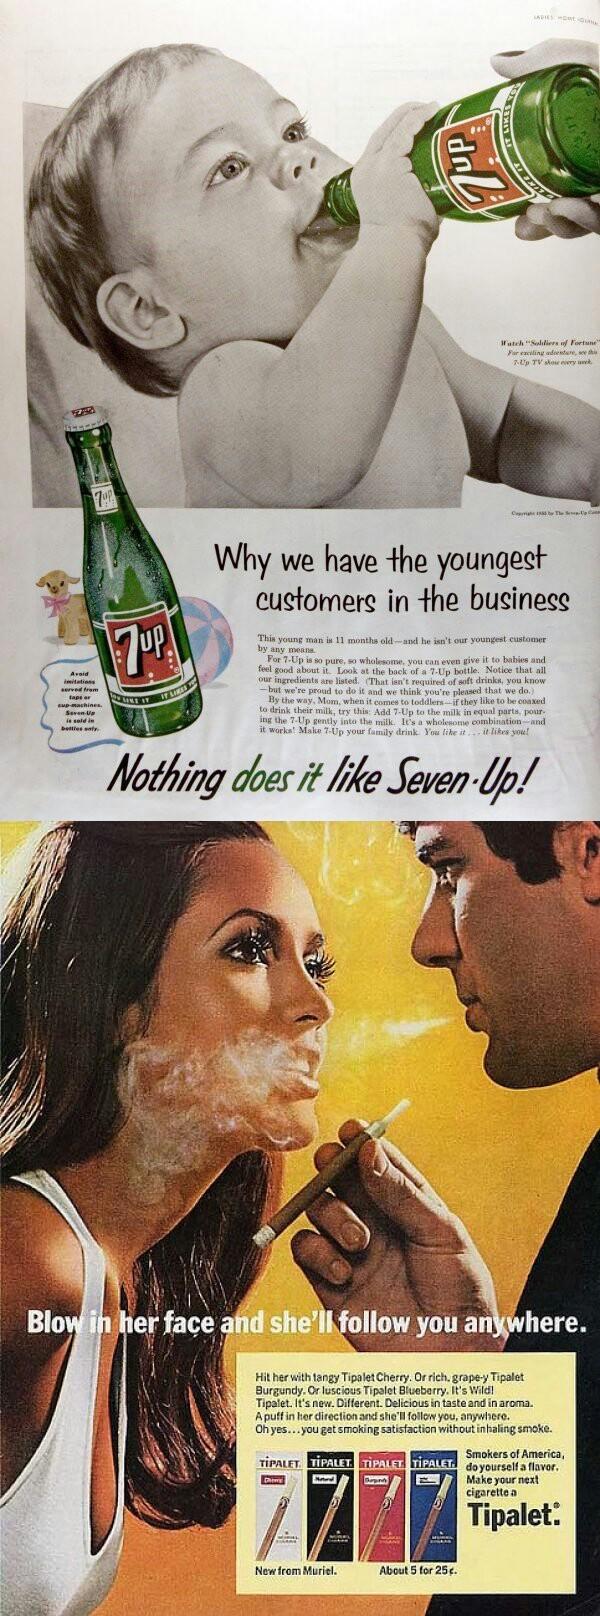 Vintage advertisements ¯\_(ツ)_/¯ - meme